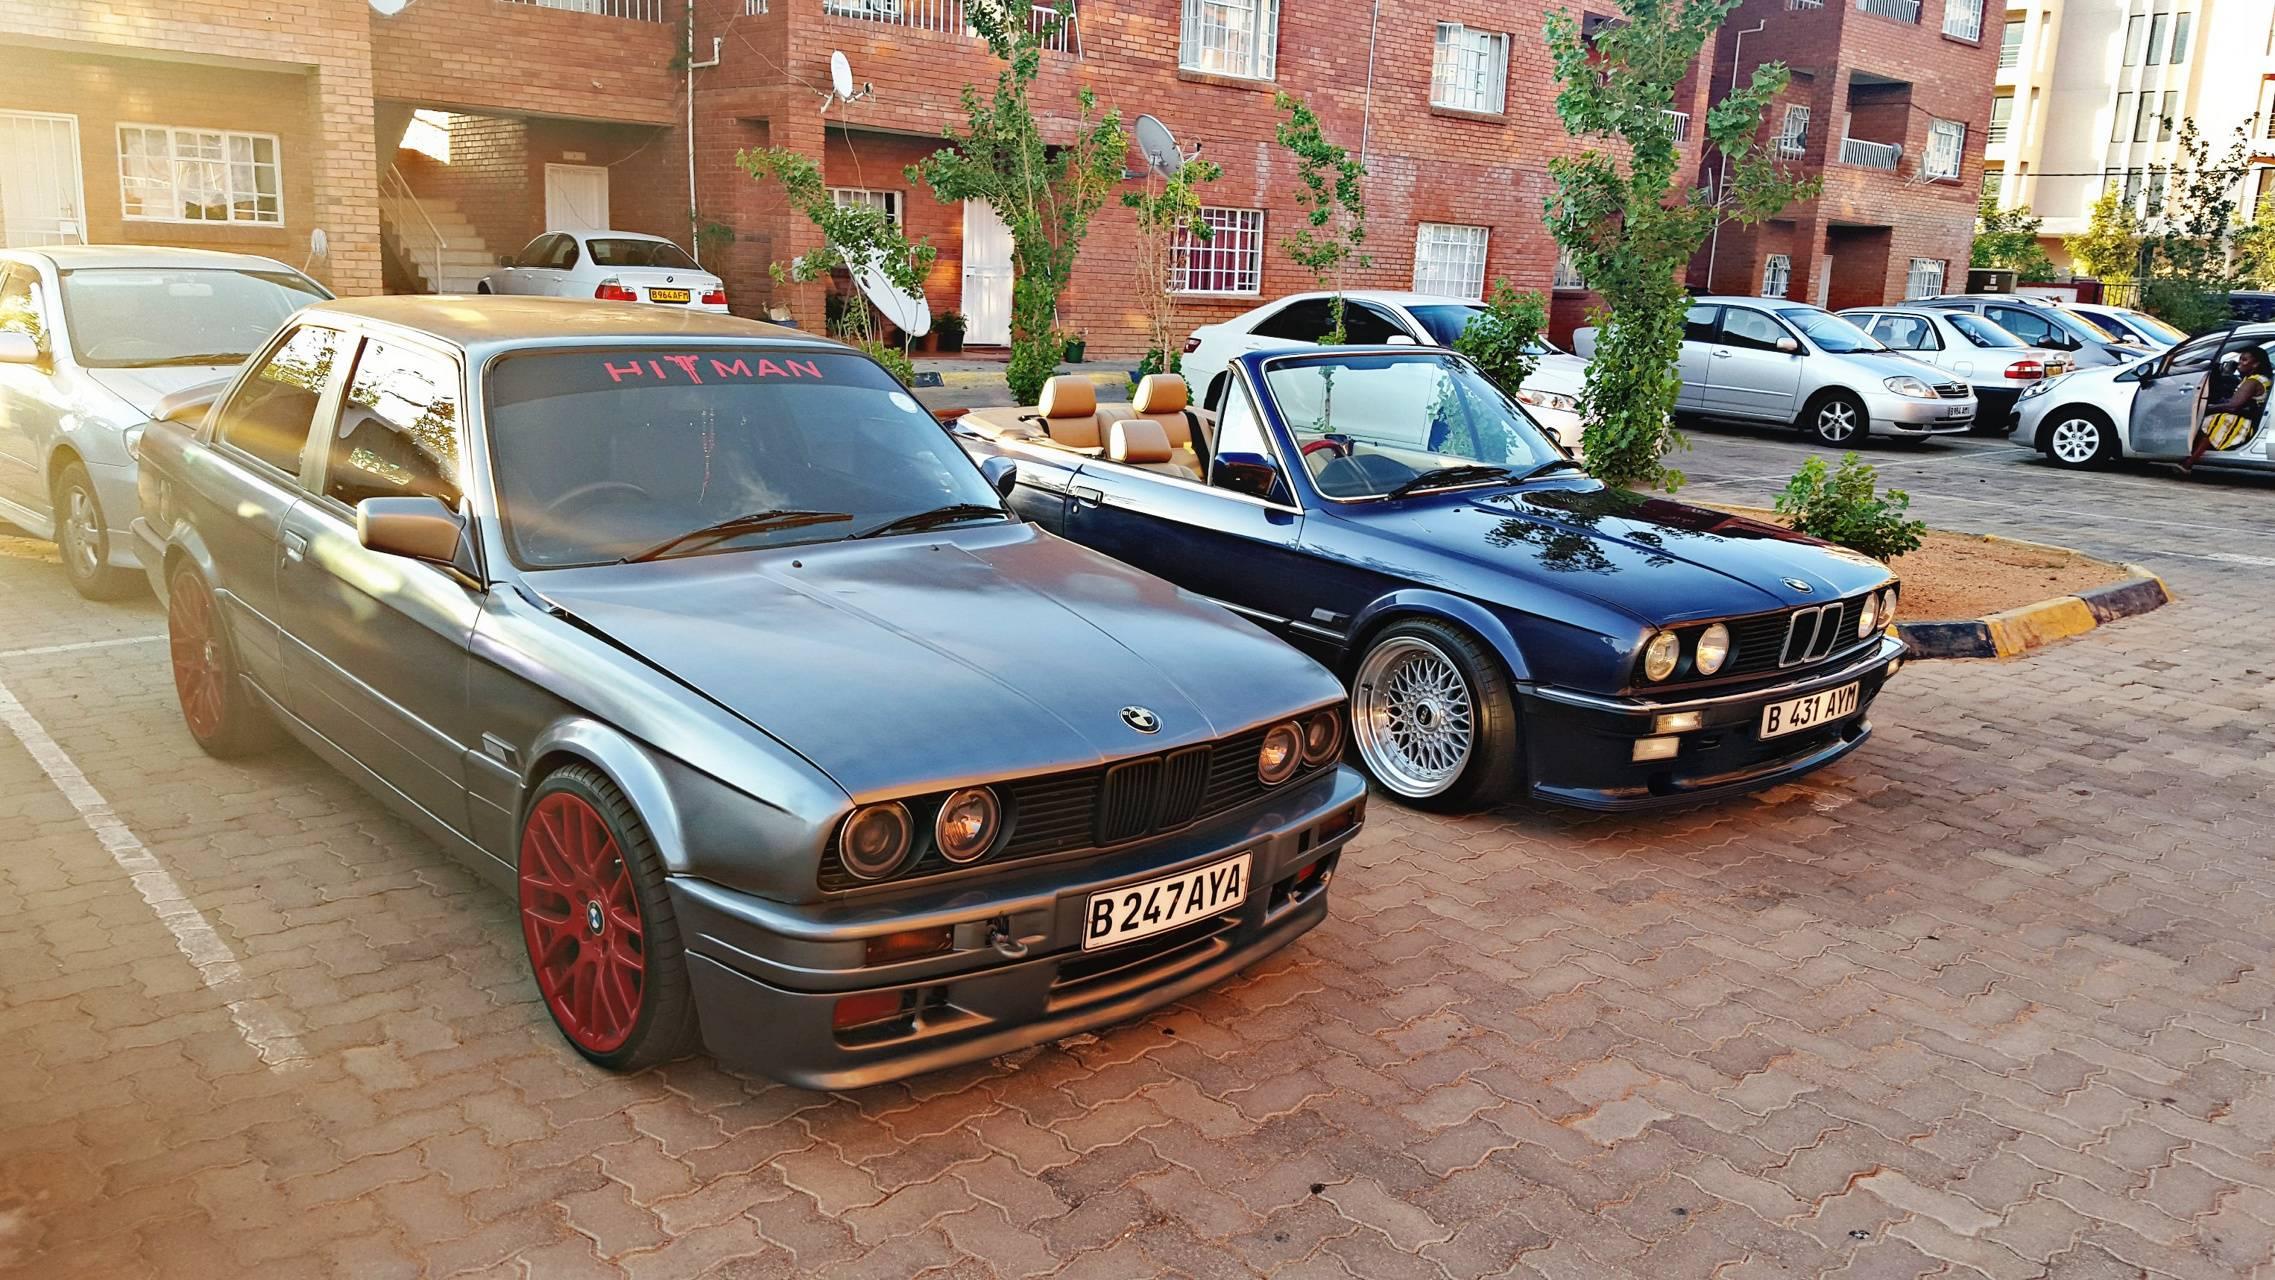 BMW E30 325is Bots